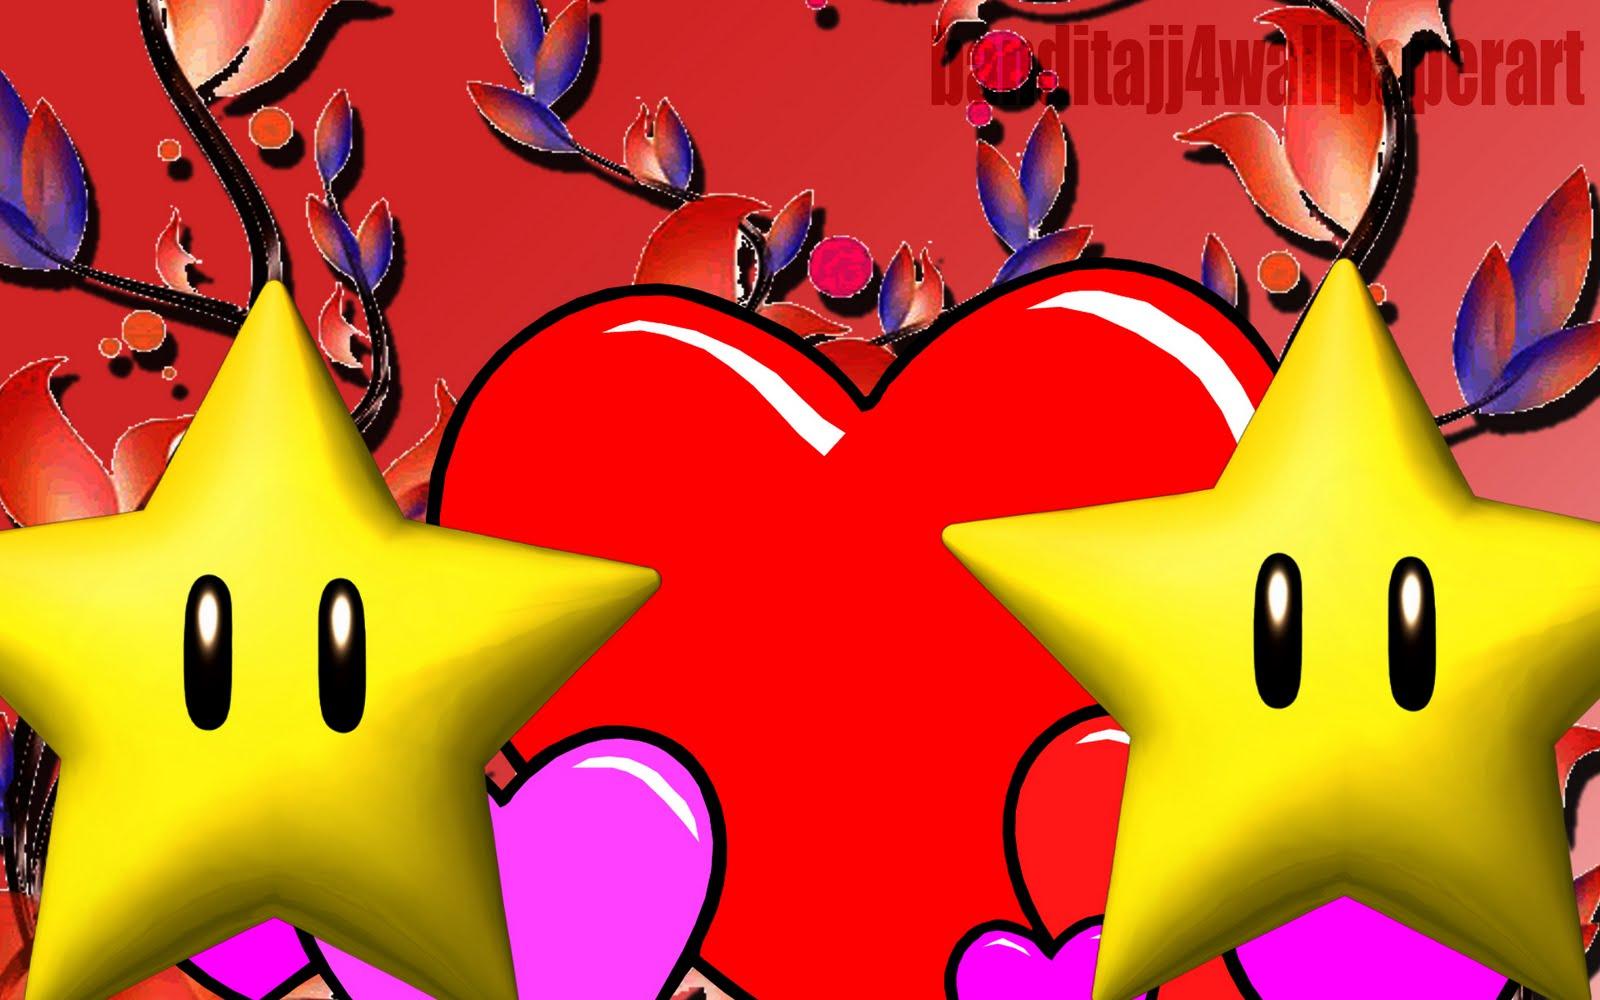 http://3.bp.blogspot.com/-7T9TrrcfxNo/TtqjmU8J3mI/AAAAAAAAA90/eJbYK4BLrnE/s1600/couple-star-falling-in-love___by_banditajj4wallpaperart.jpg